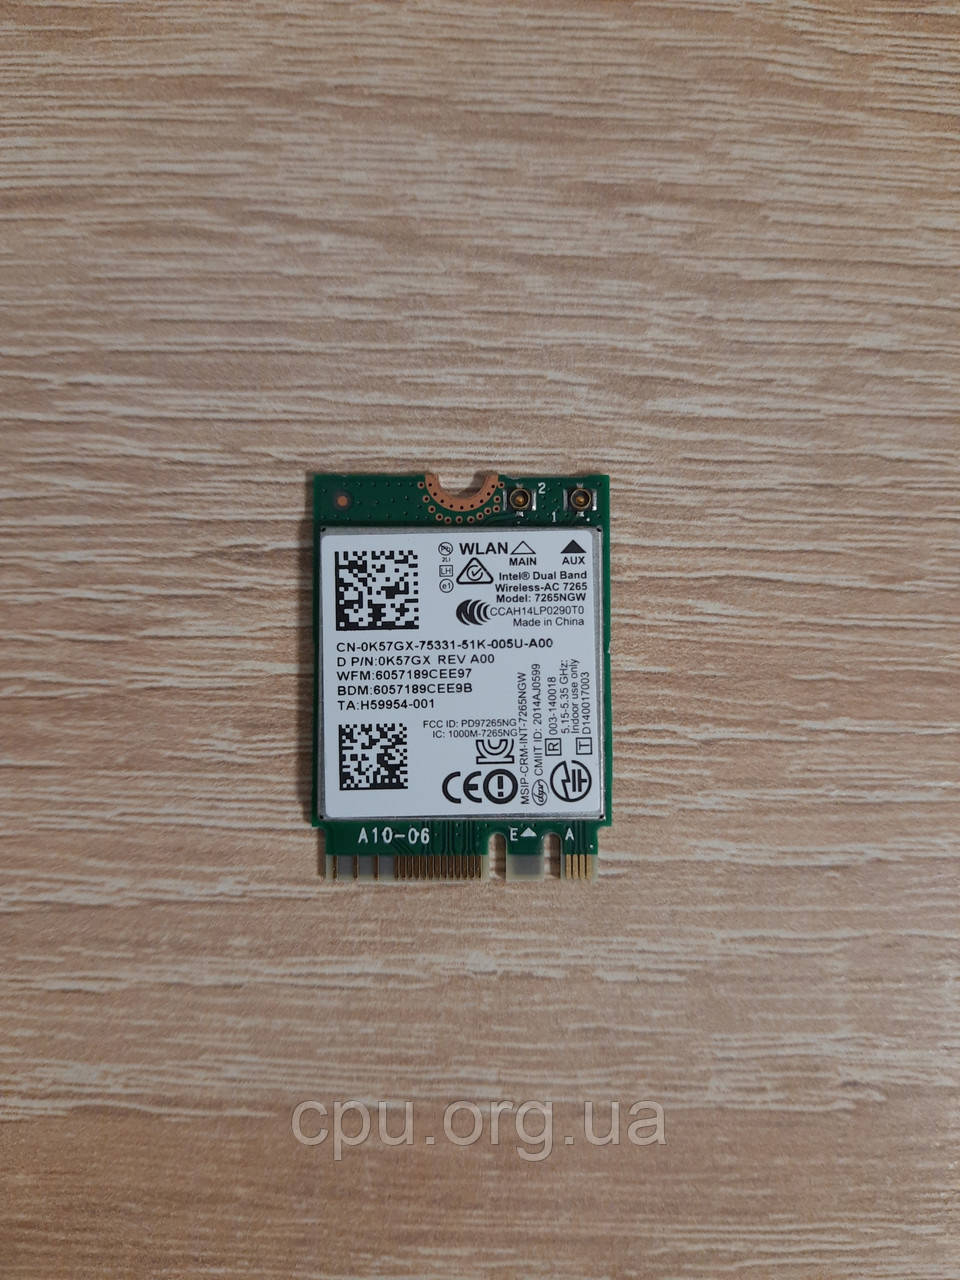 Wifi адаптер / сетевую карту Intel 7265NGW M 2 с Dell Latitude E5450